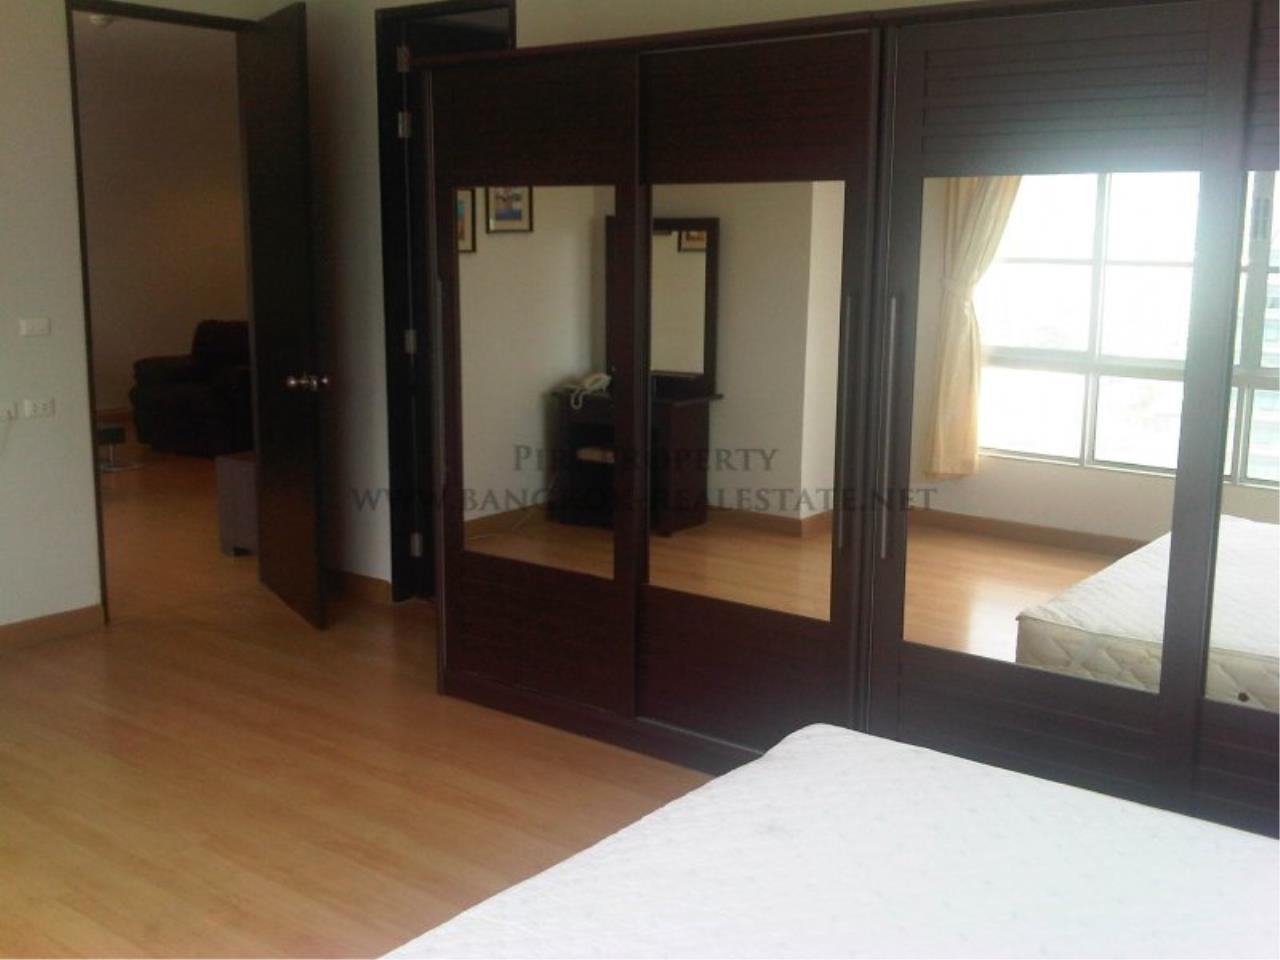 Piri Property Agency's 3 Bedroom Penthouse Unit - AP Citismart for Rent 7